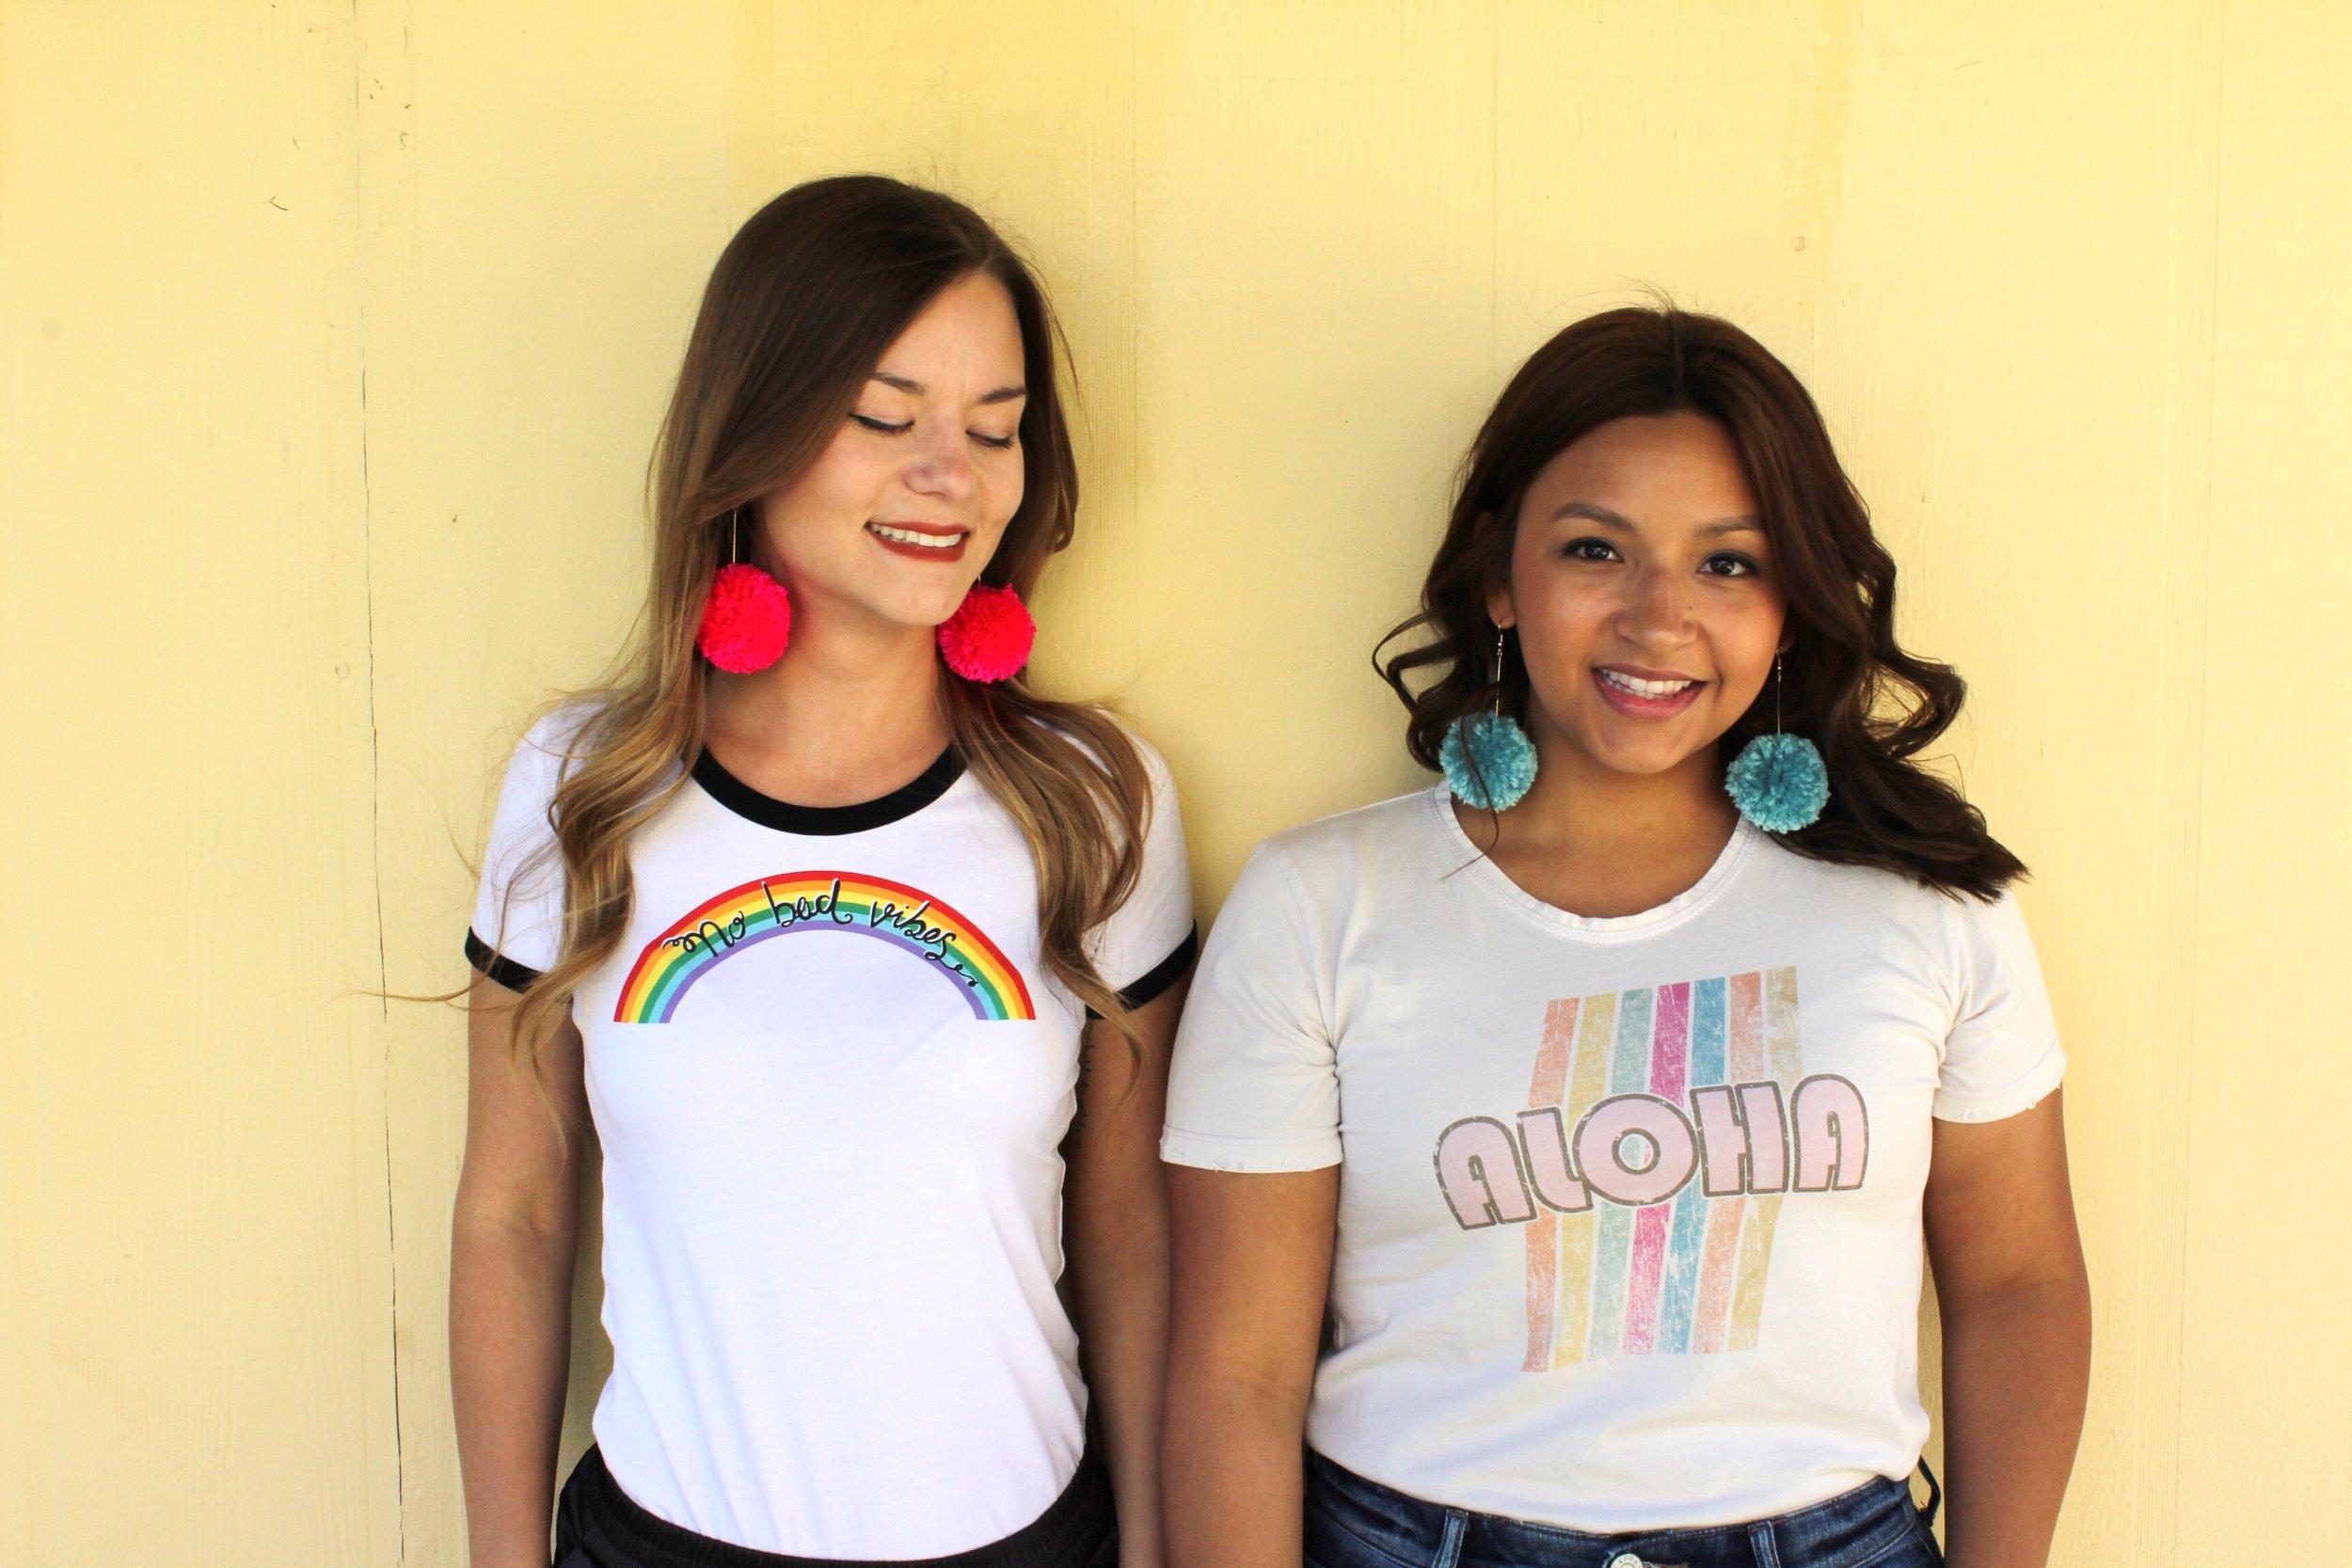 Rainbow Tees and 70's Style Hair and pom pom earrings.